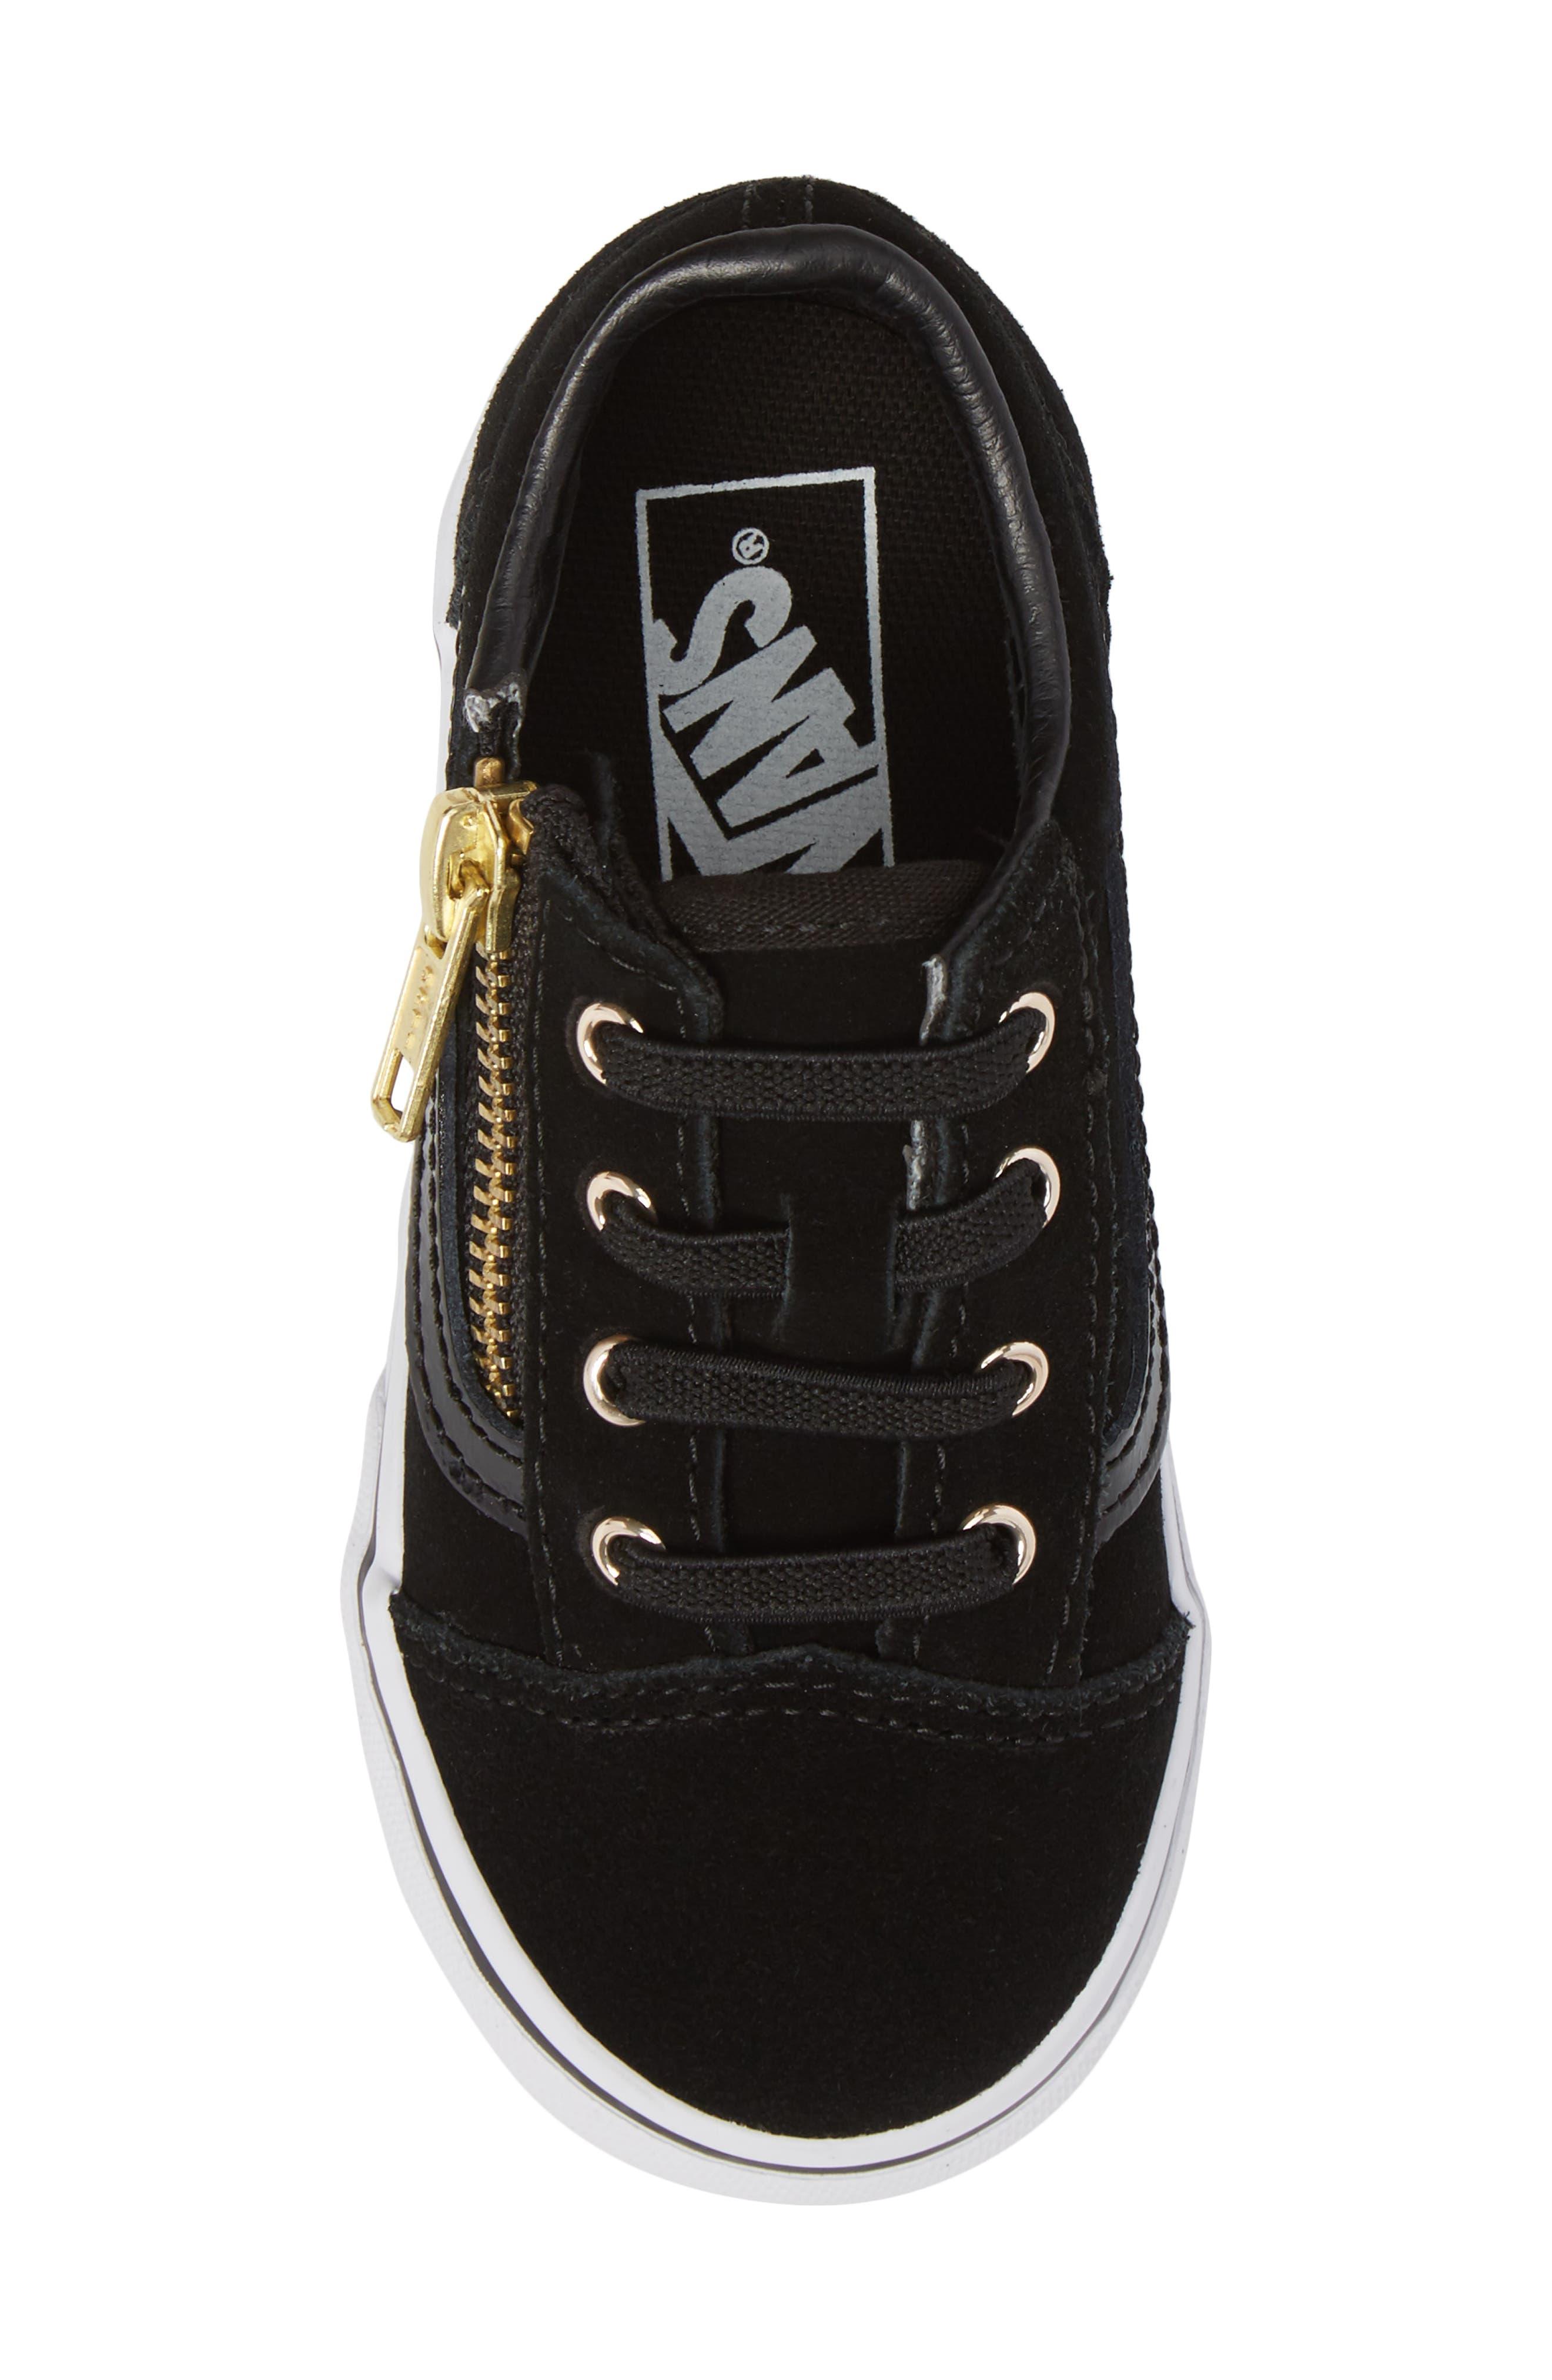 Old Skool Zip Sneaker,                             Alternate thumbnail 5, color,                             Black/ Gold